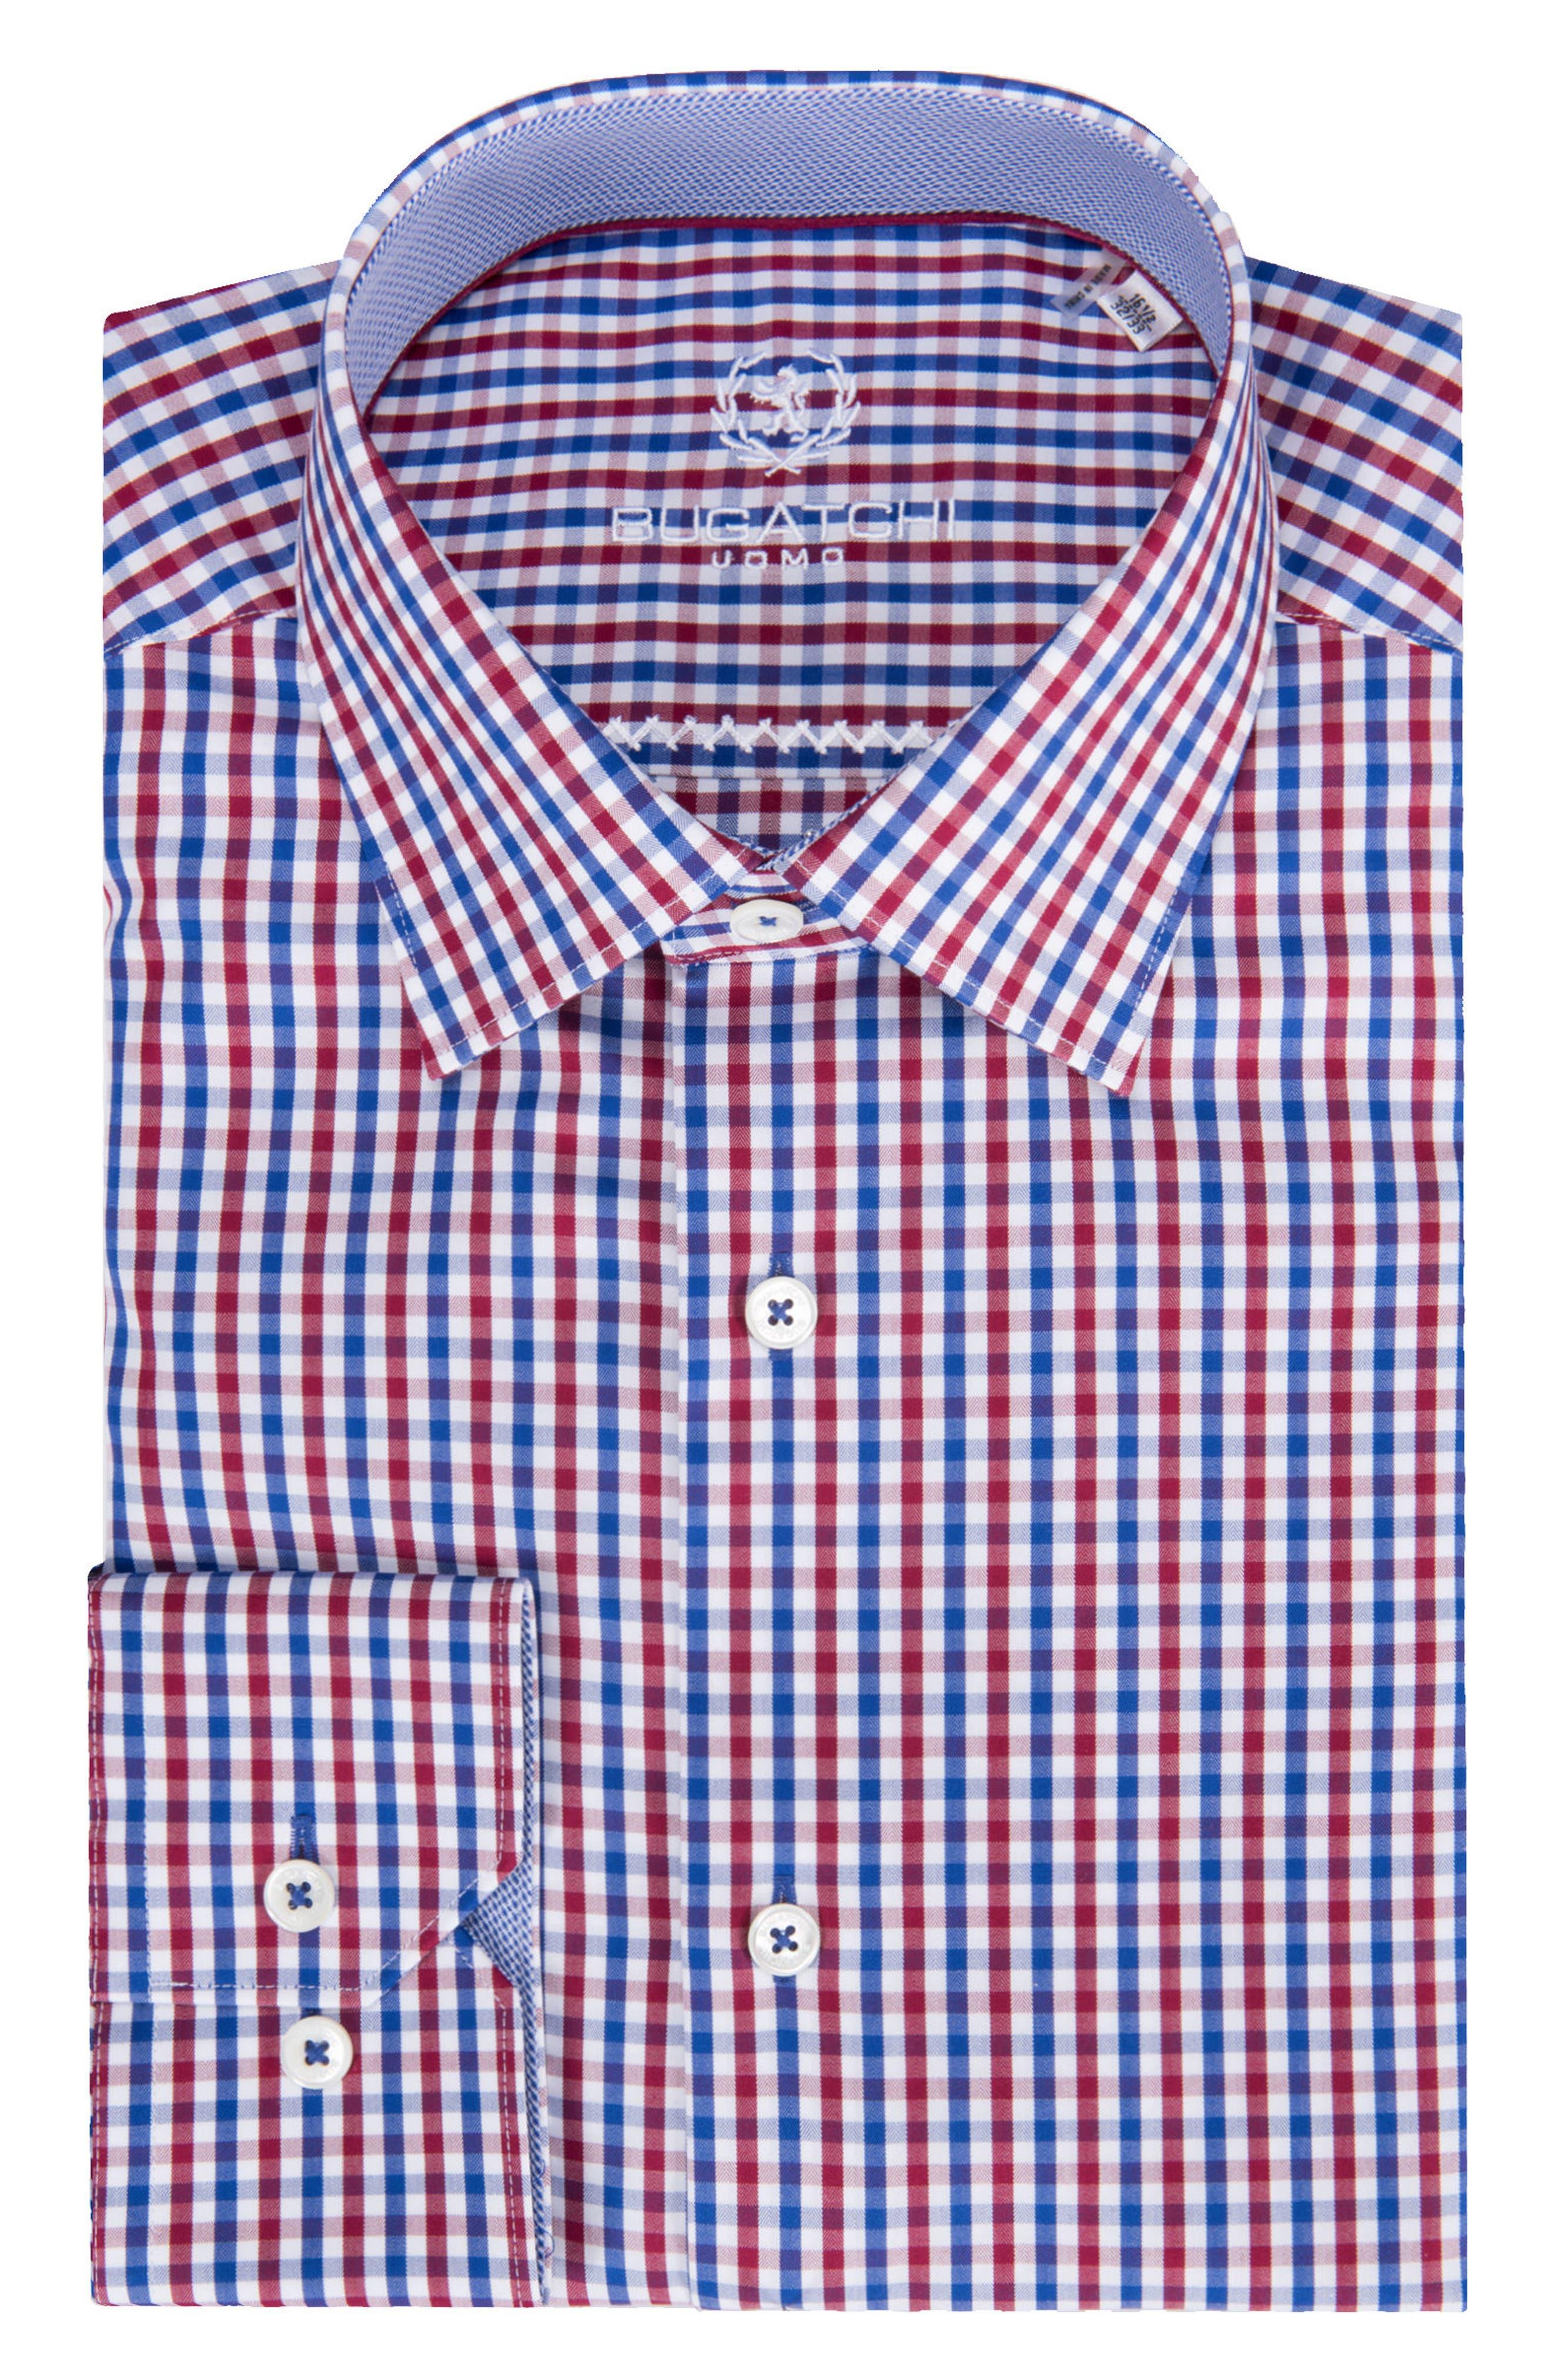 BUGATCHI Trim Fit Check Dress Shirt, Main, color, 612